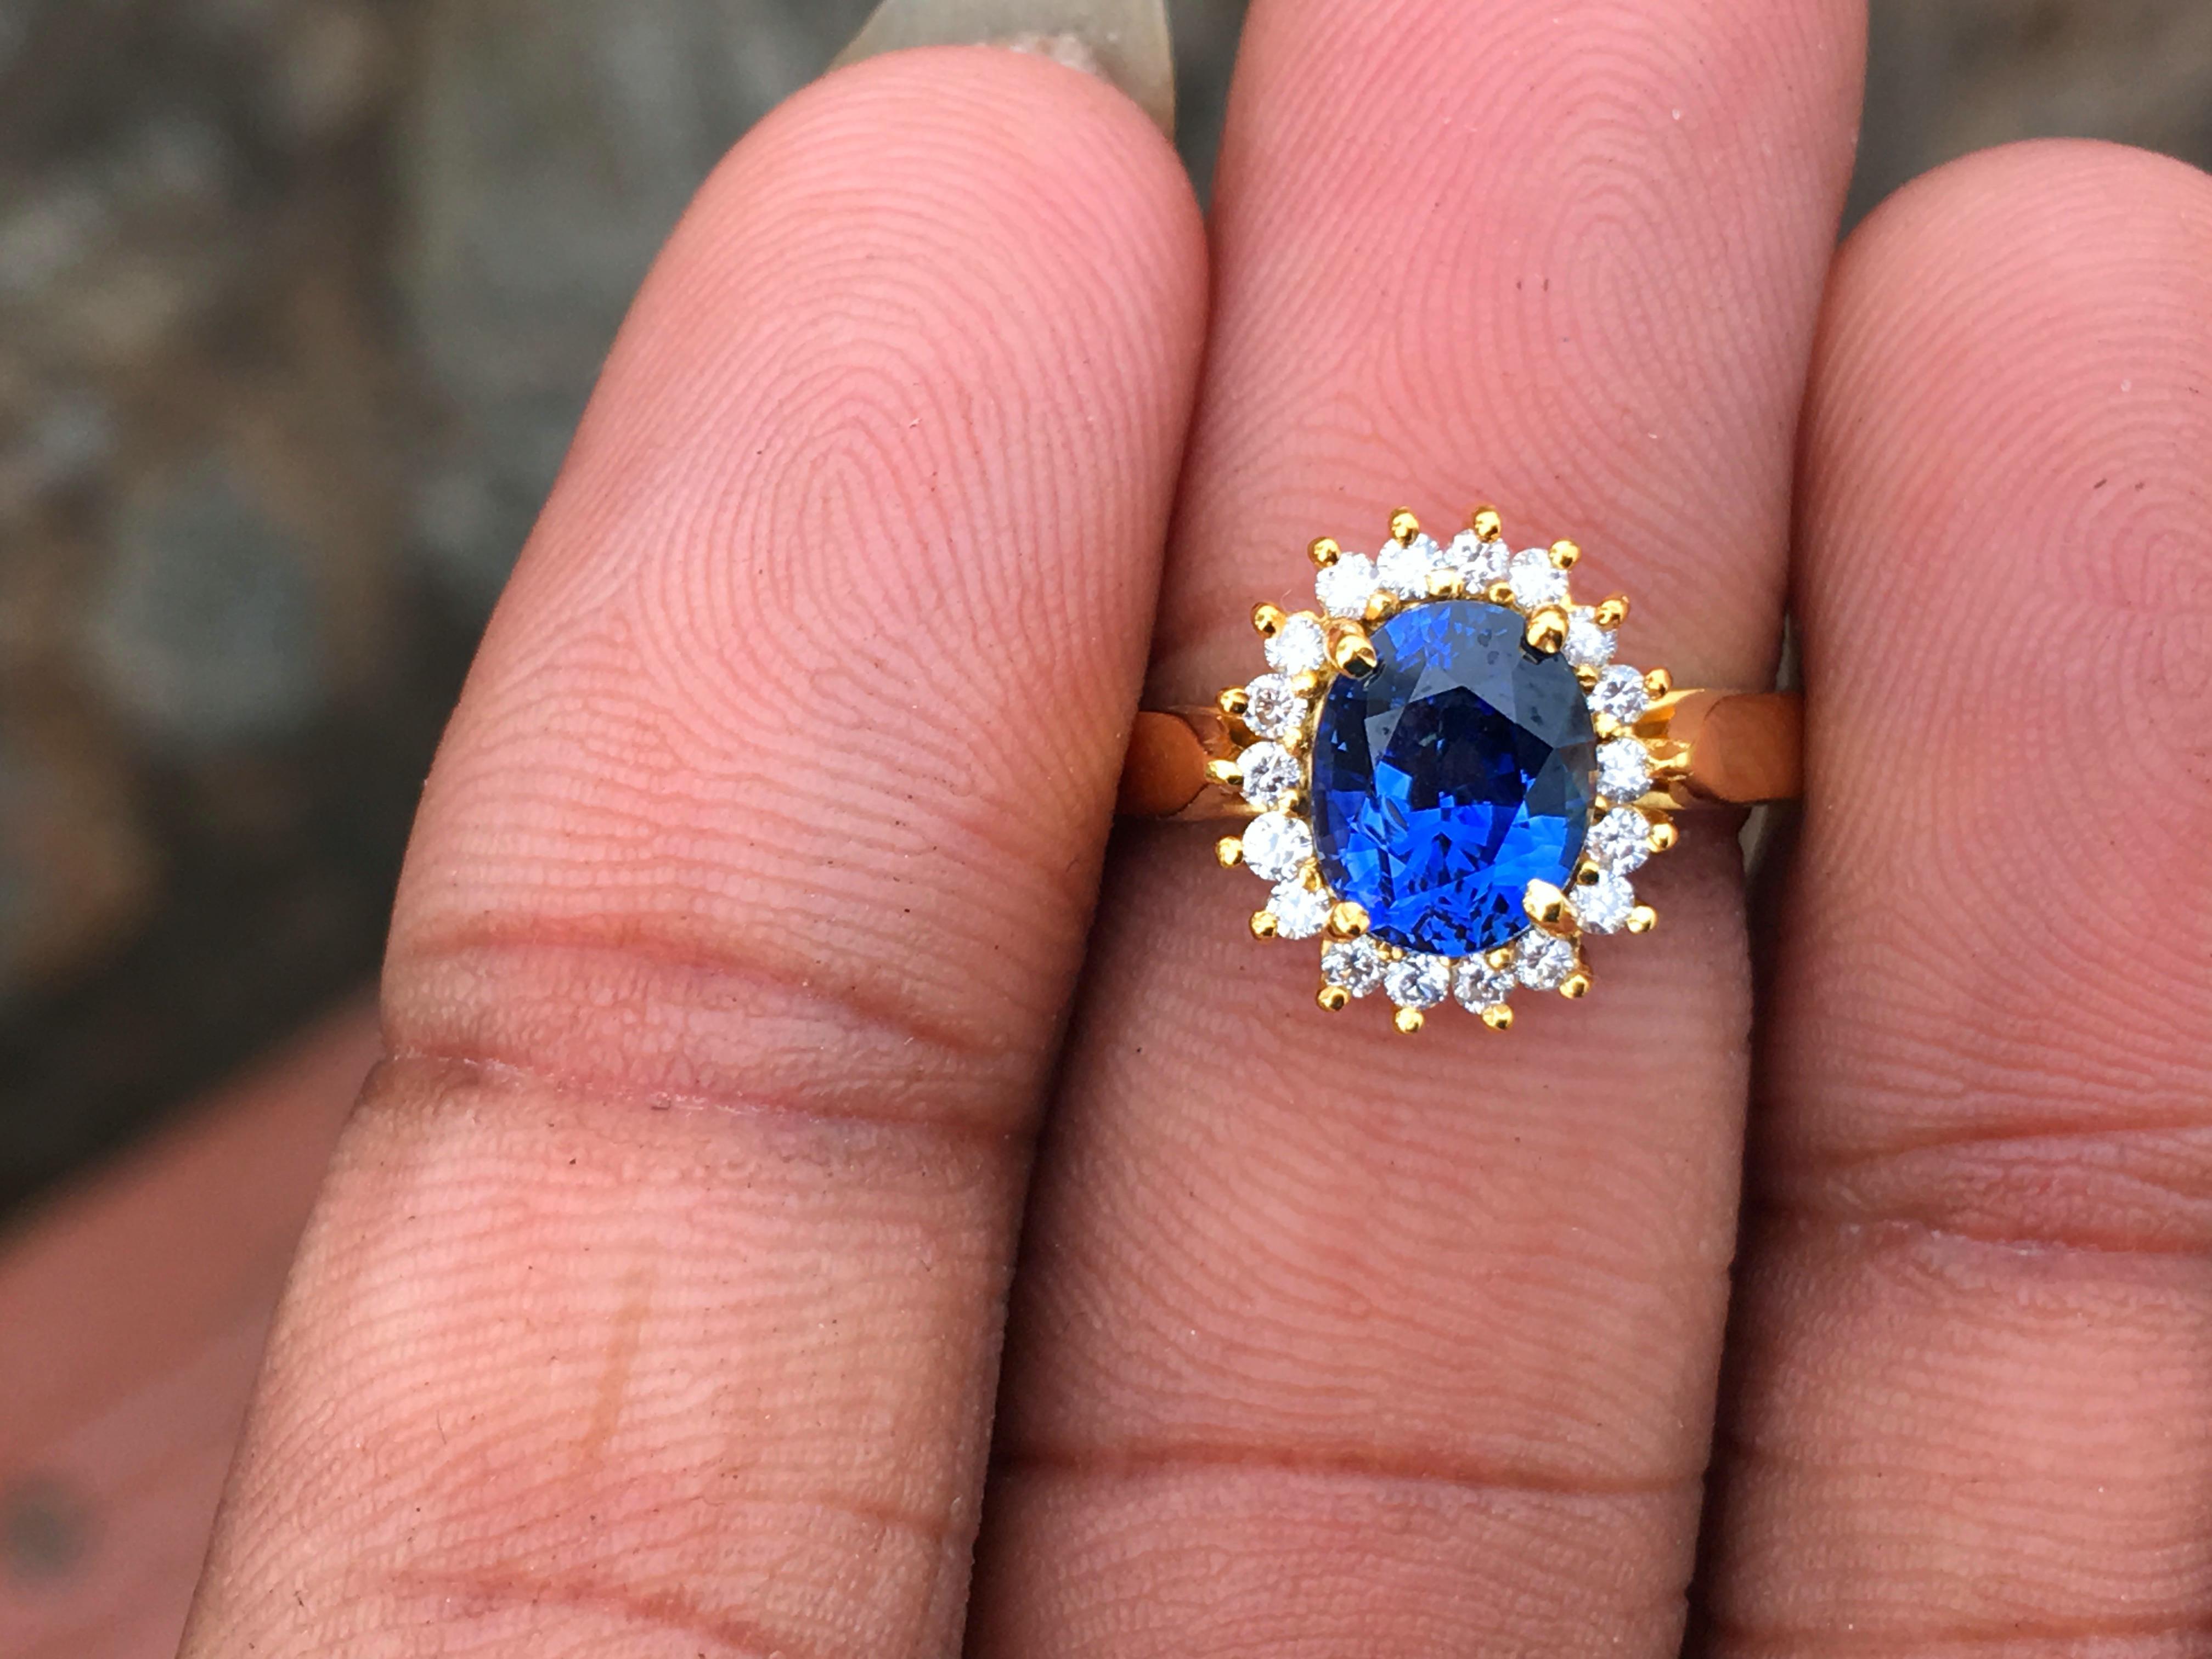 Vintage Lady Diana Engagement Ring Kate Middleton Ring 18k White Gold